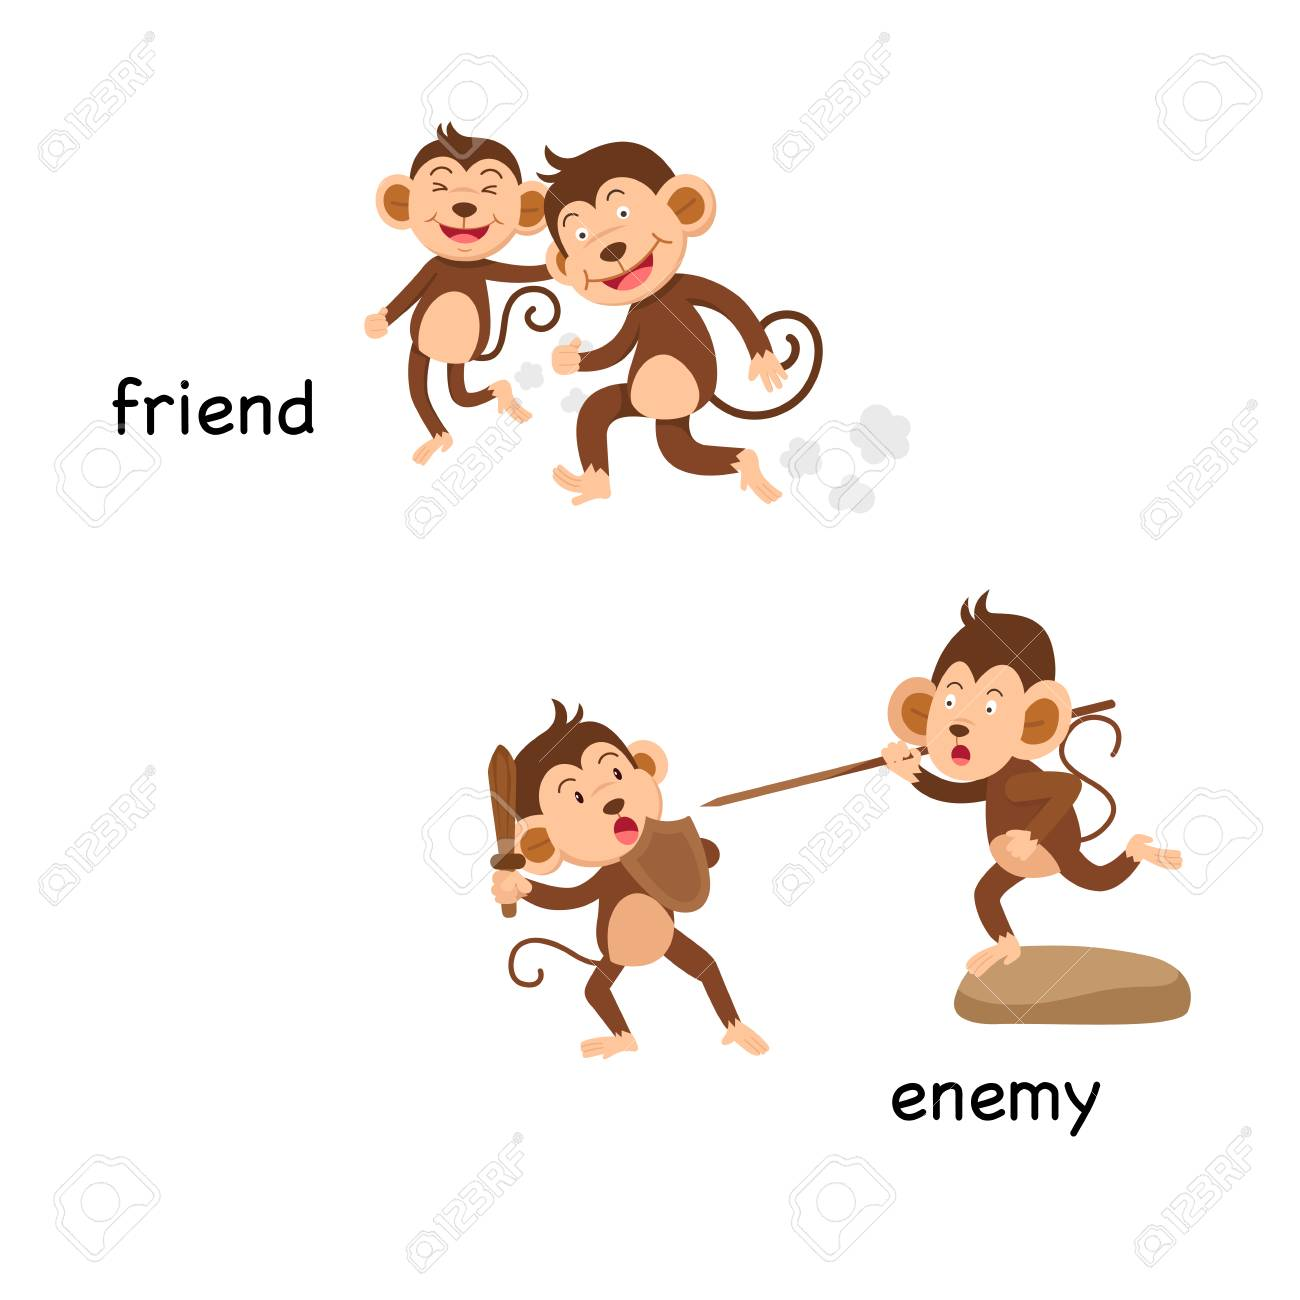 opposite of friend